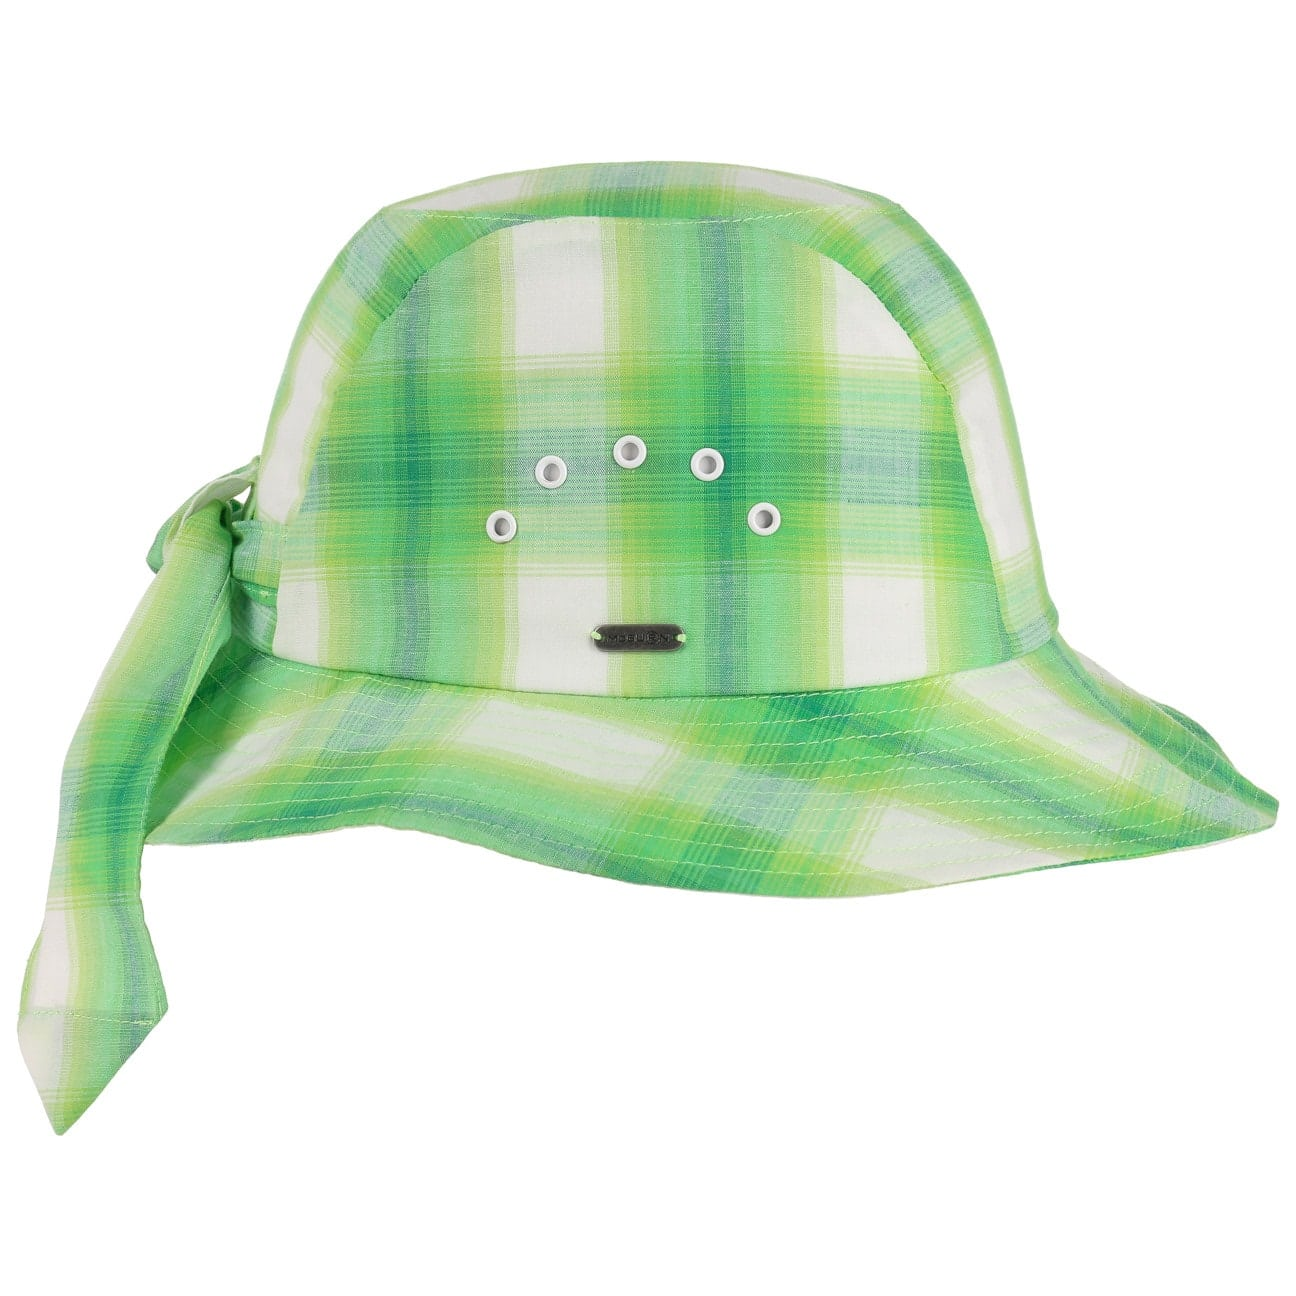 Sombrero para el Sol Quadri by McBURN - Sombreros - sombreroshop.es 0523f44a083